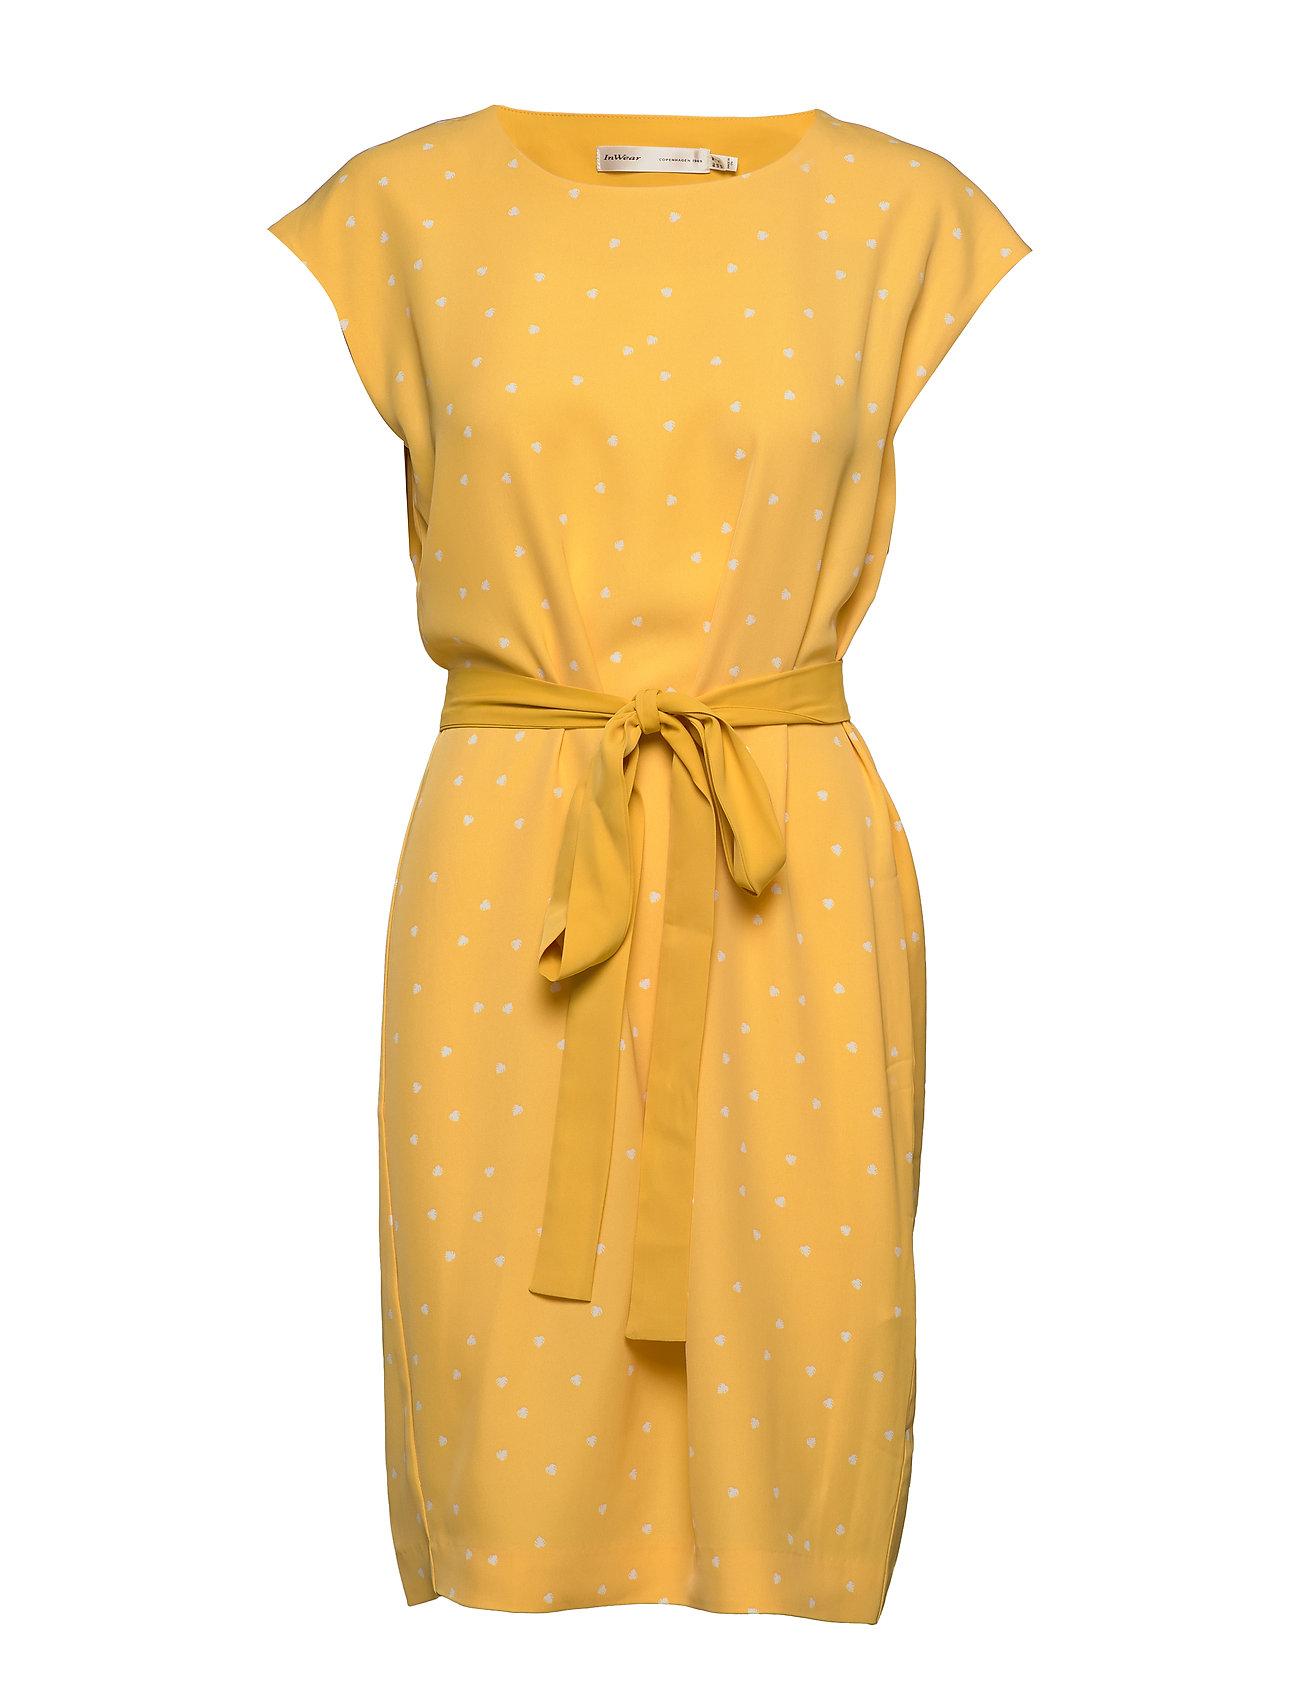 InWear Saffron Dress - YELLOW SMALL LEAF